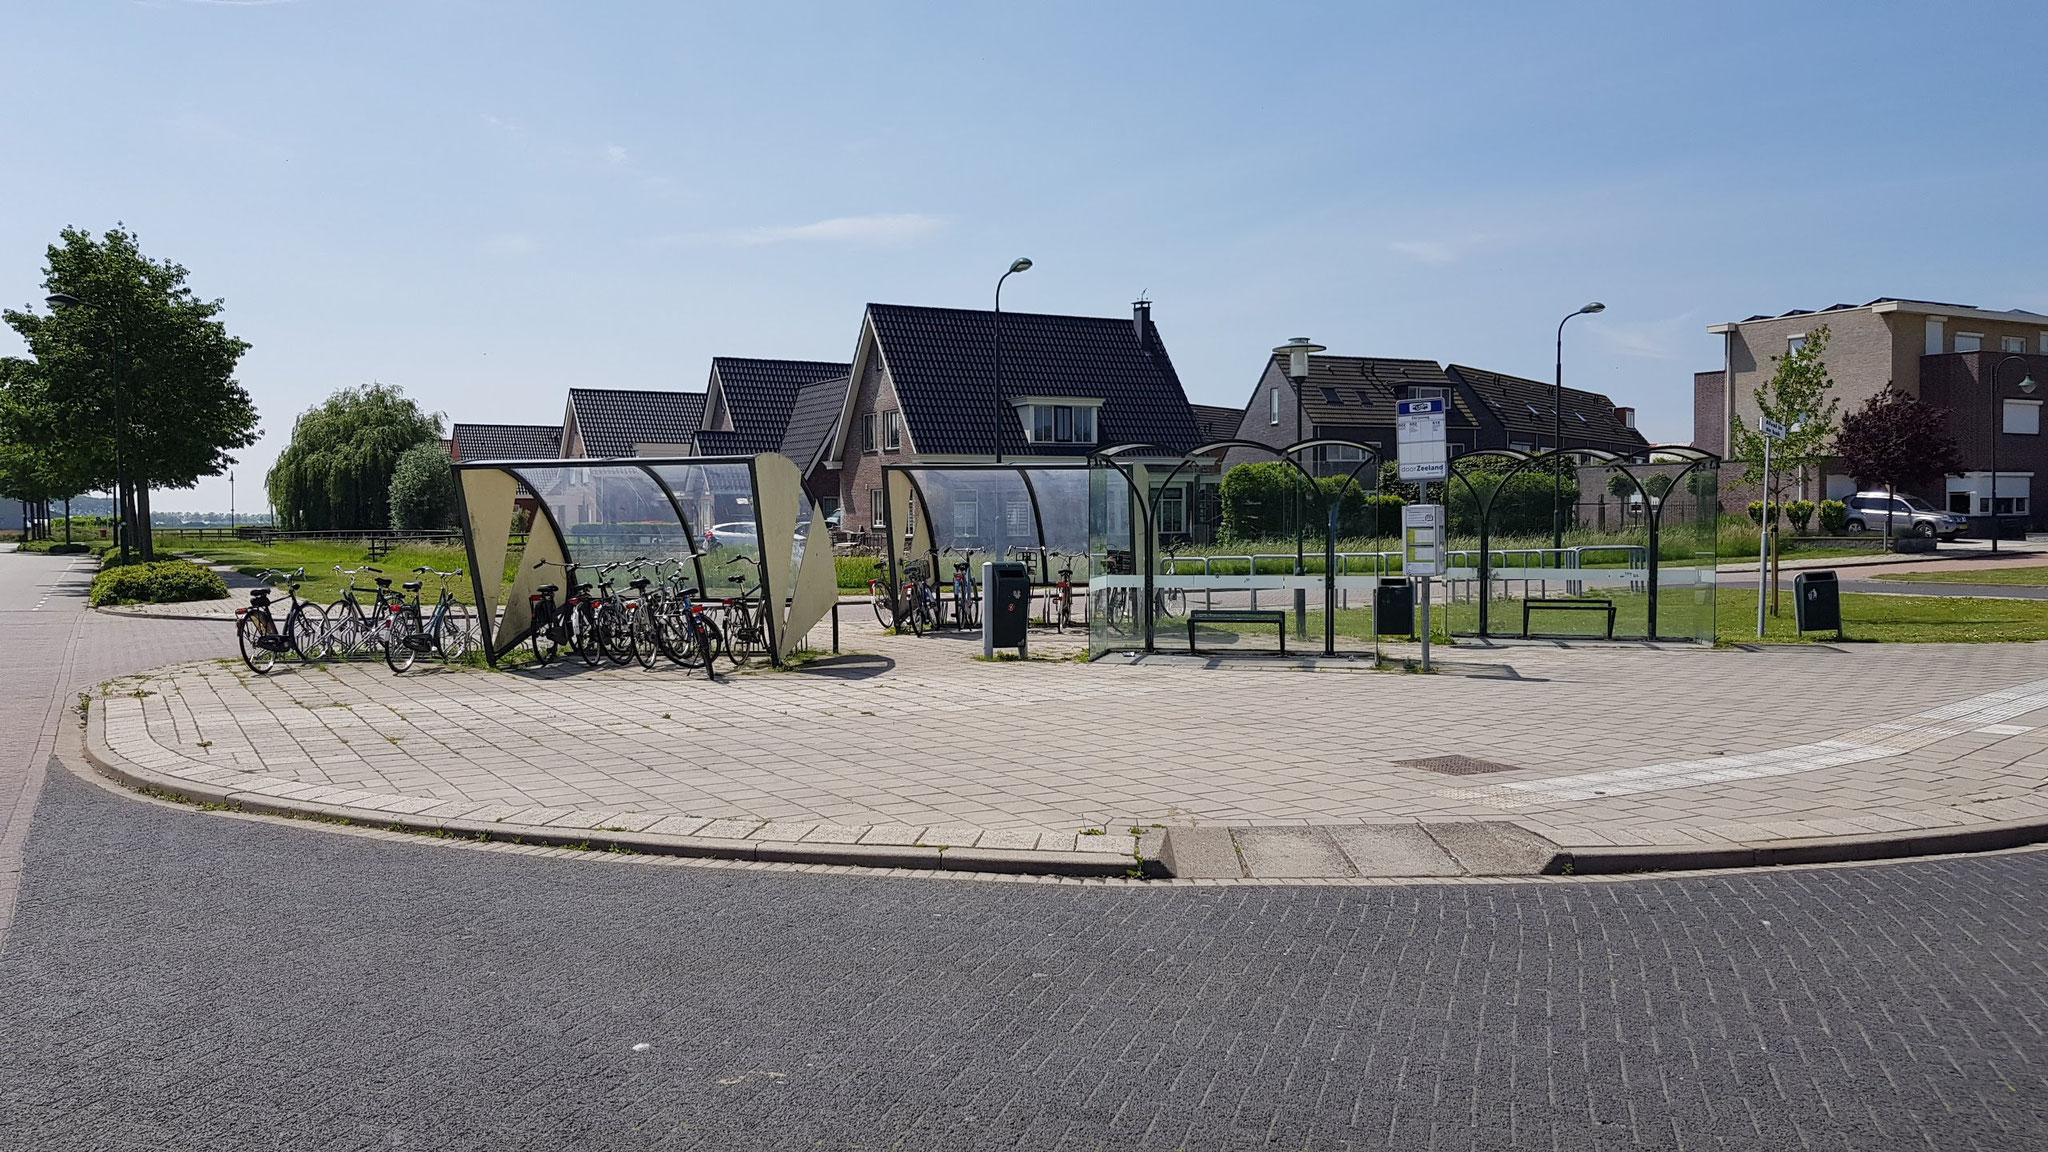 Fahrrad- Abstelle in Sint Annaland